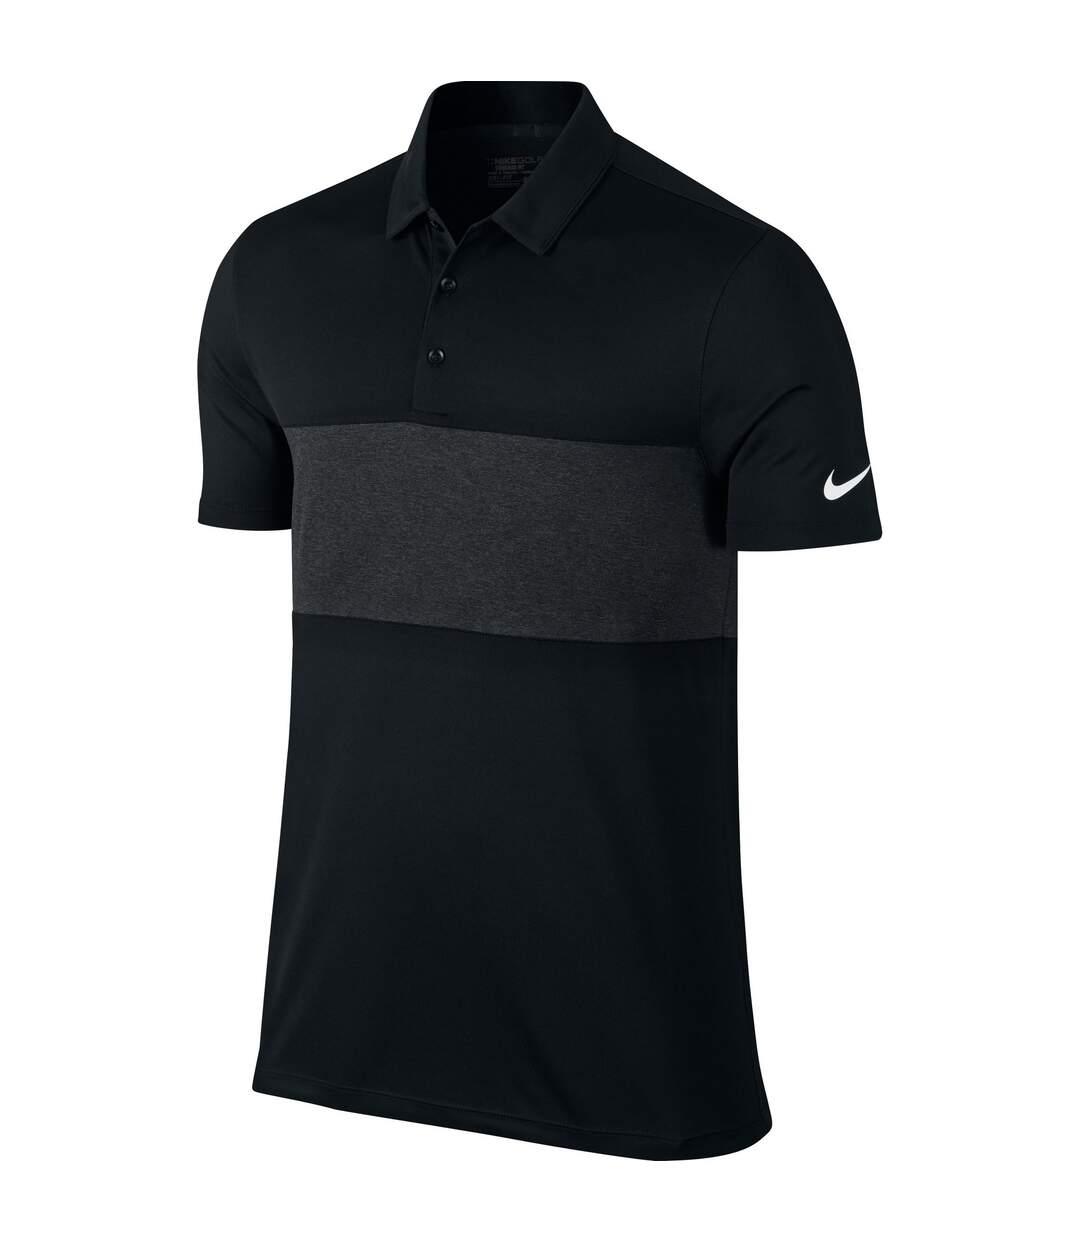 Nike Mens Breathe Colour Block Short Sleeve Polo Shirt (Black/Black Heather/White) - UTRW5599